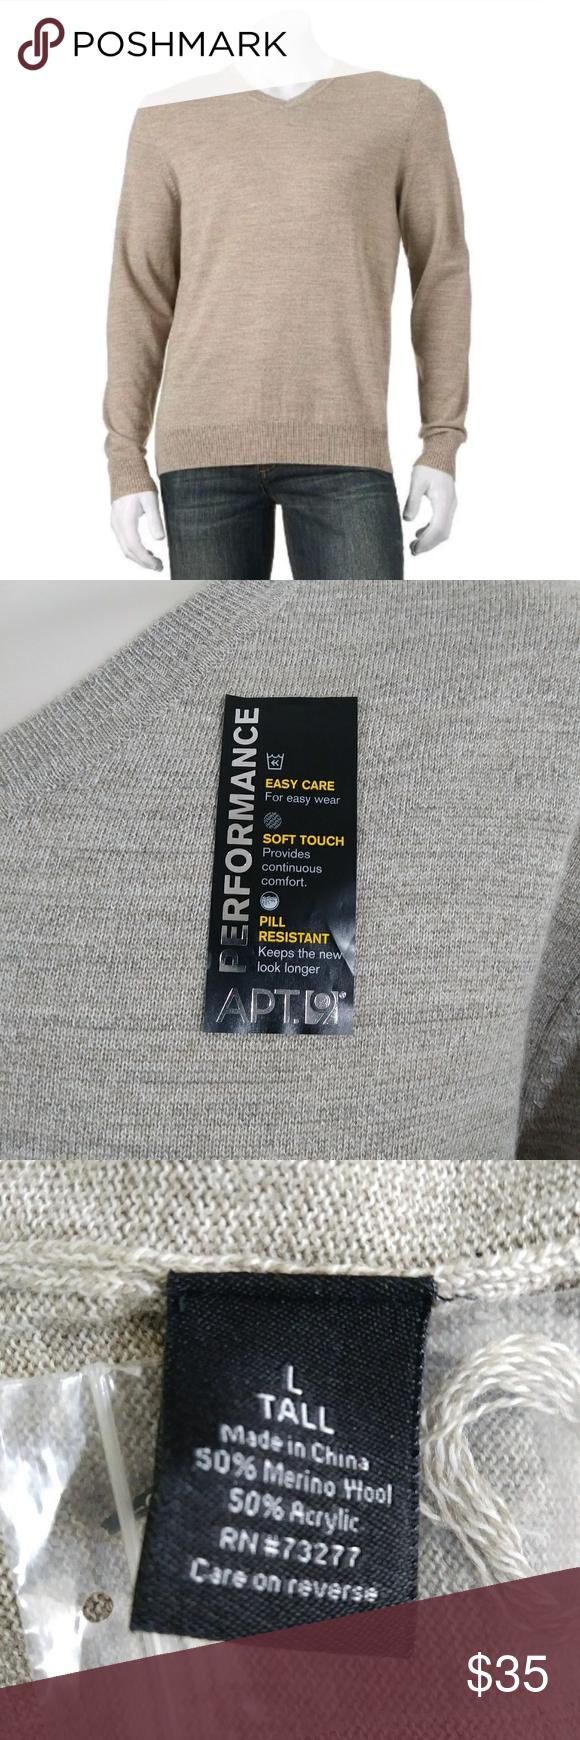 9 heather black v-neck merino wool blend sweater NWT $75 Tall LargeTall Apt